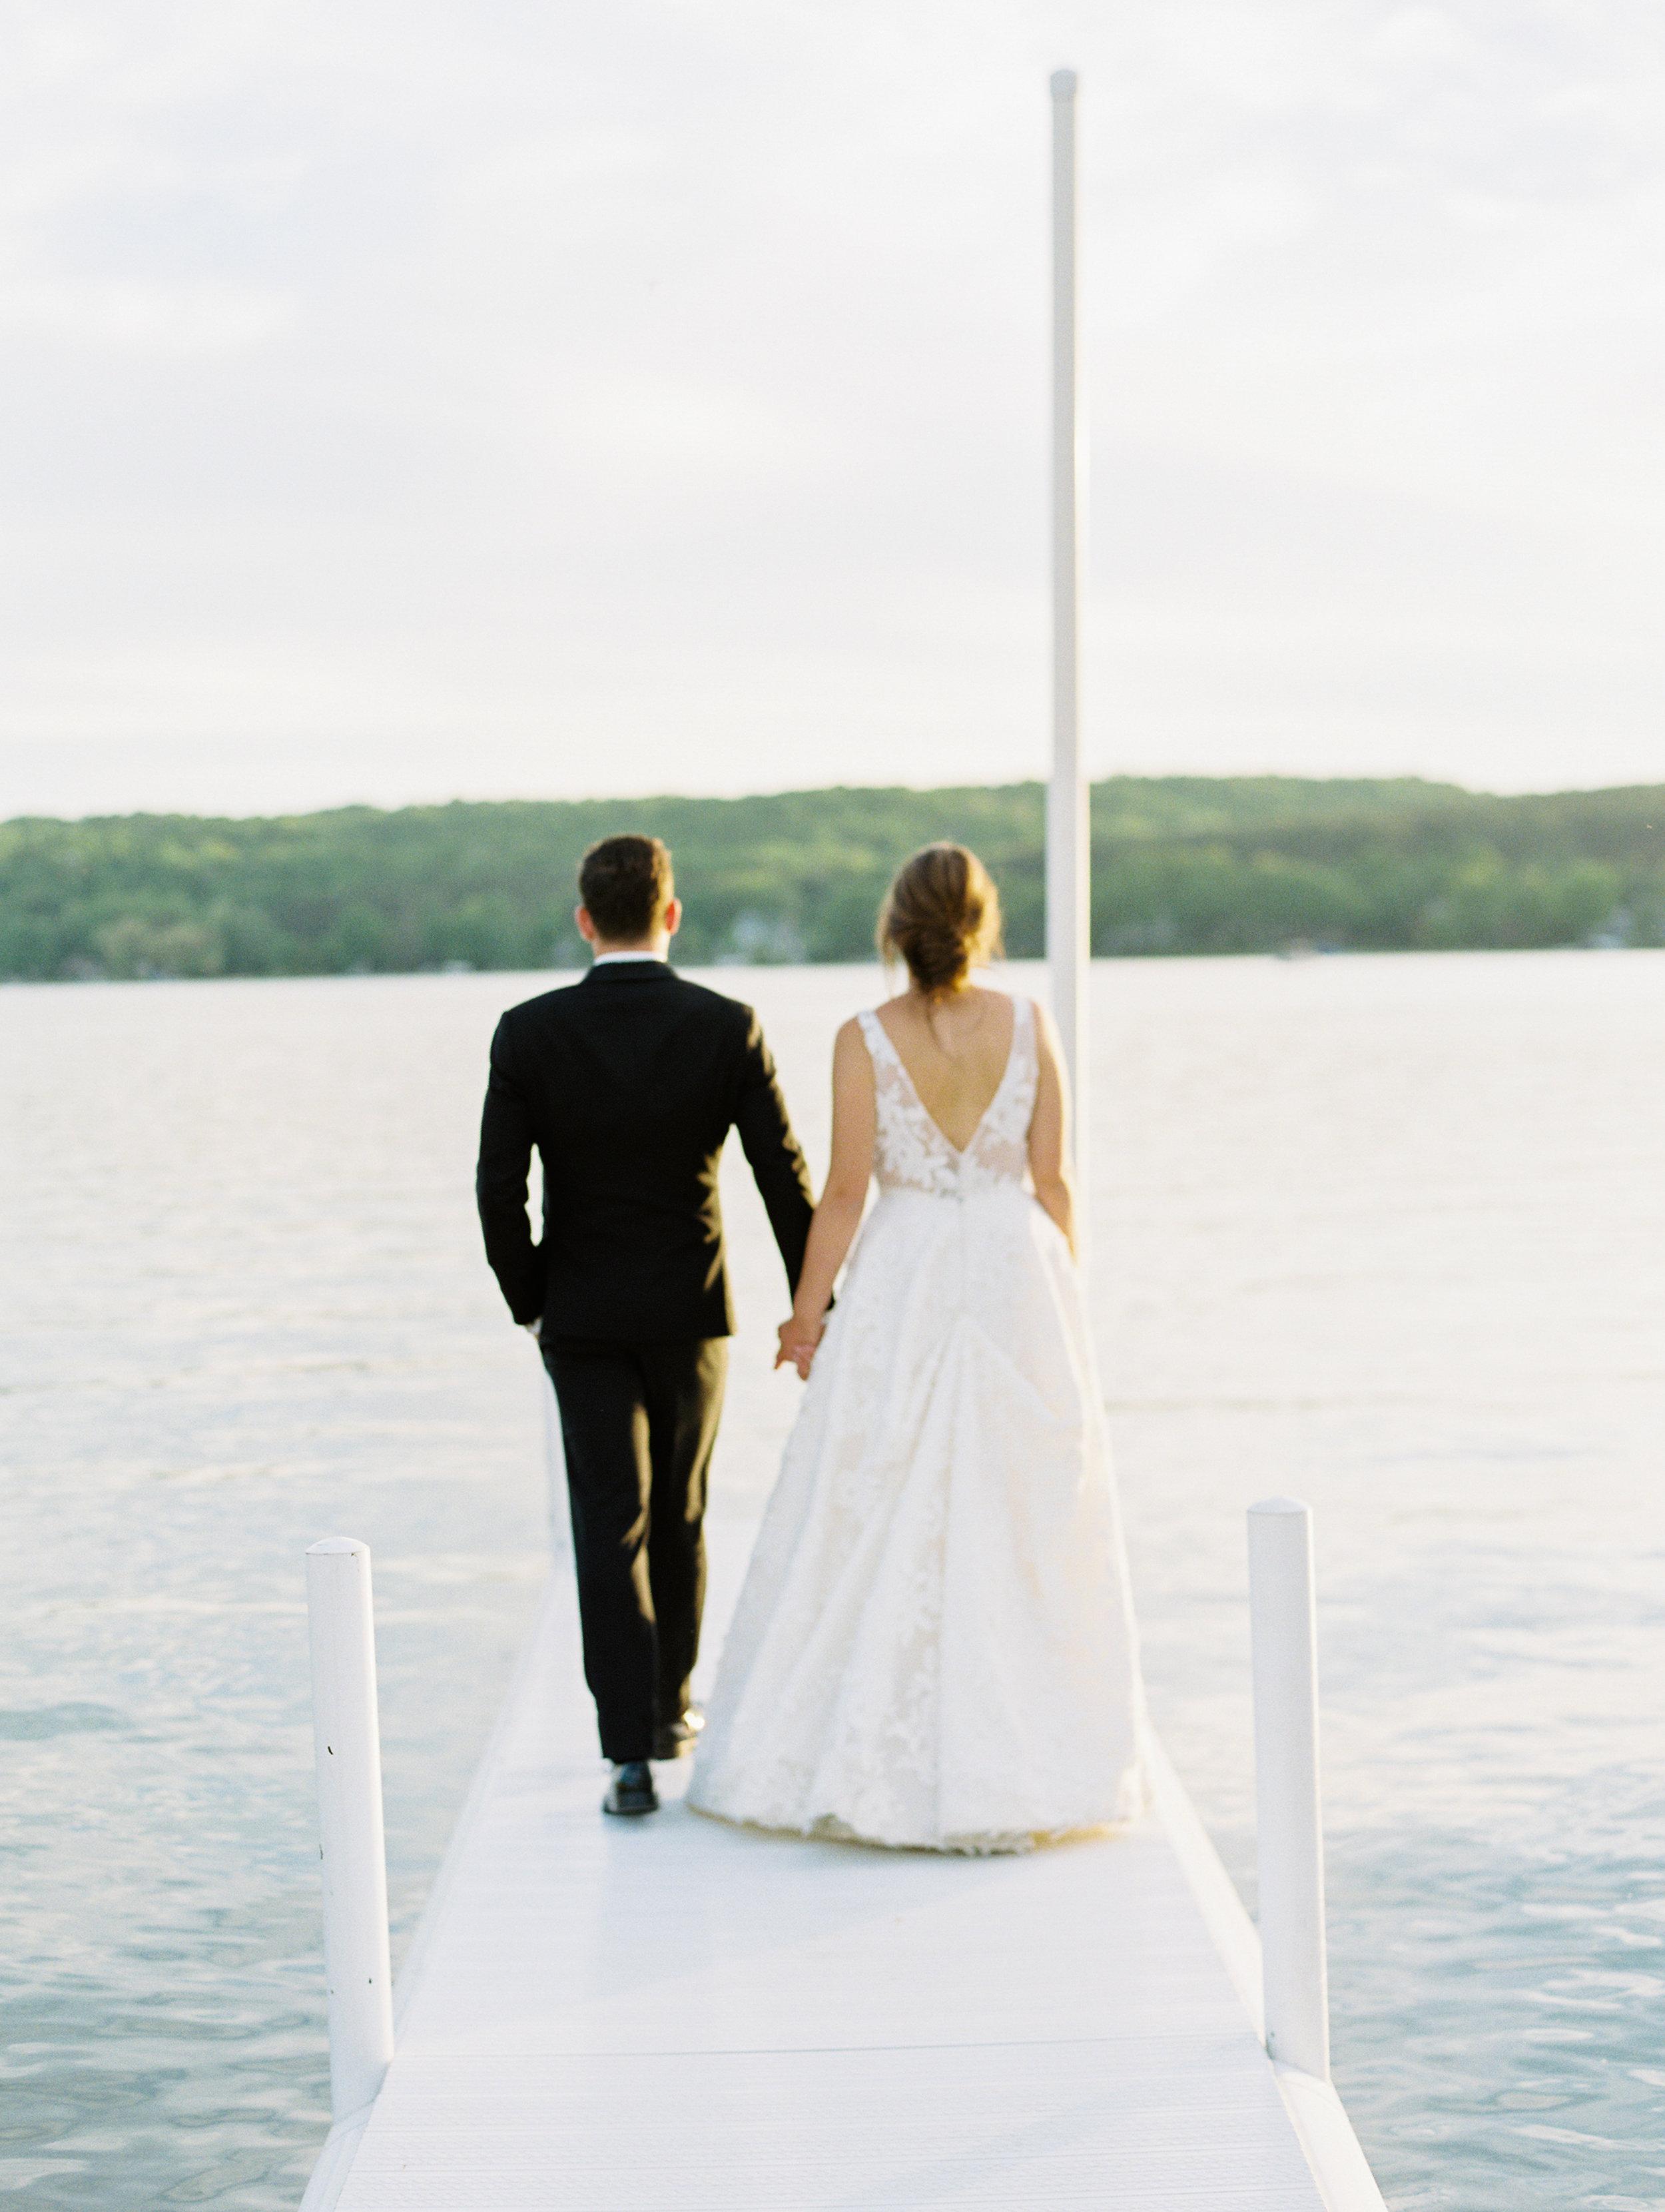 DeGuilio+Wedding+BrideGroomSunsetf-4.jpg